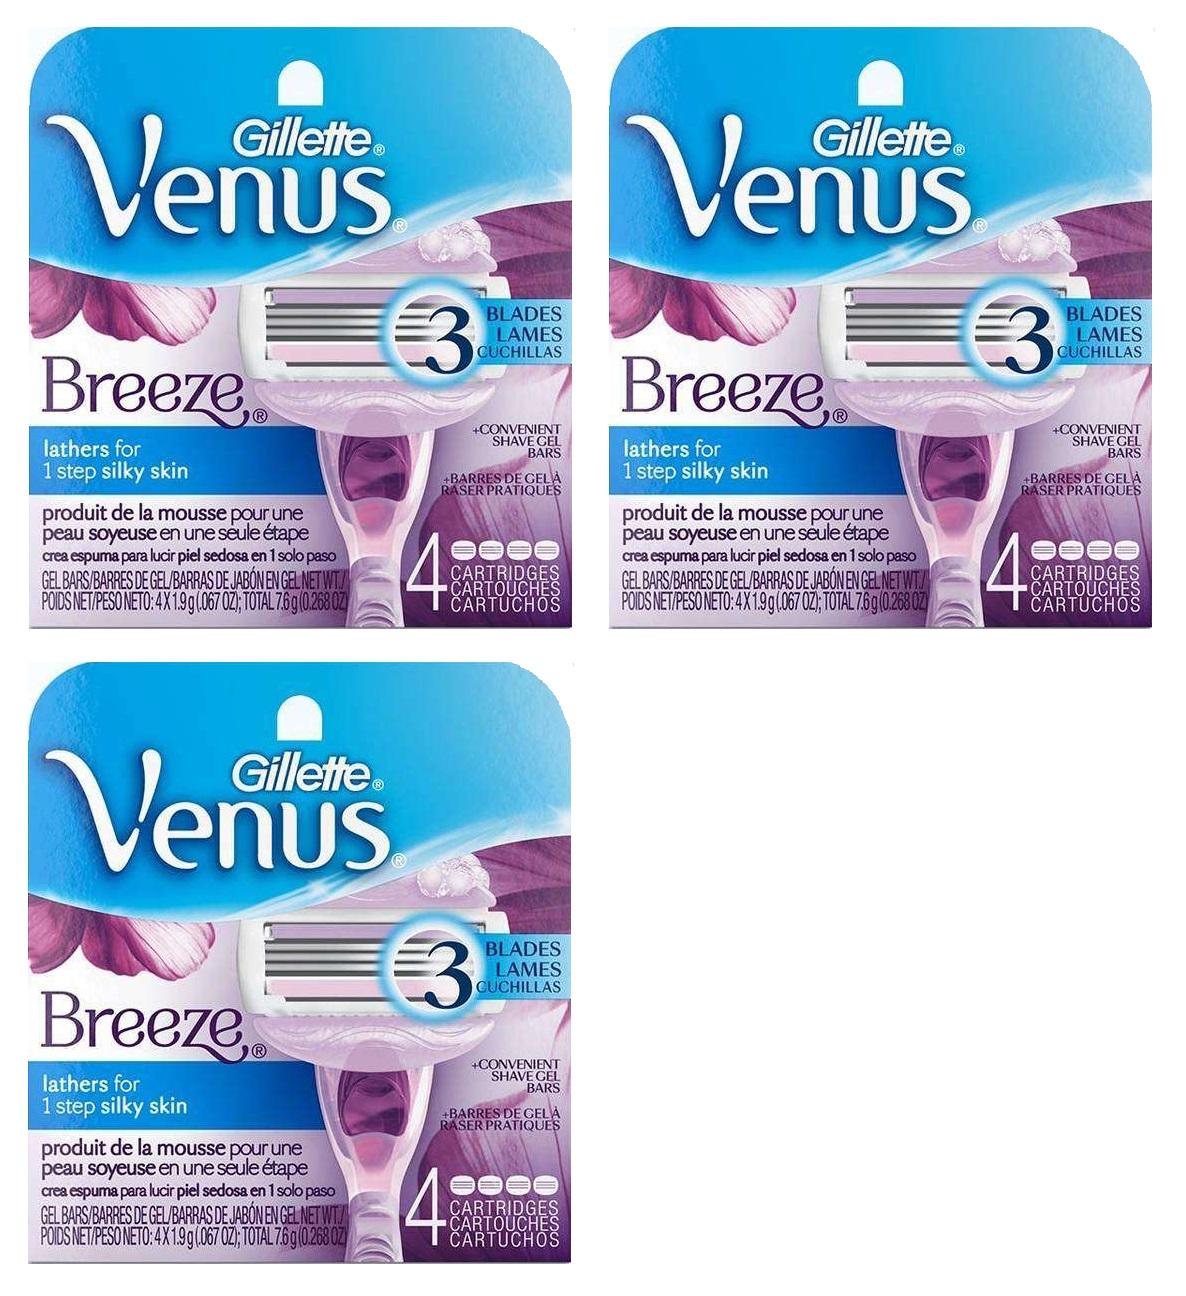 Gillette Venus Breeze Refill Razor Blade Cartridges, 12 Count (3 Packs of 4 Ct)